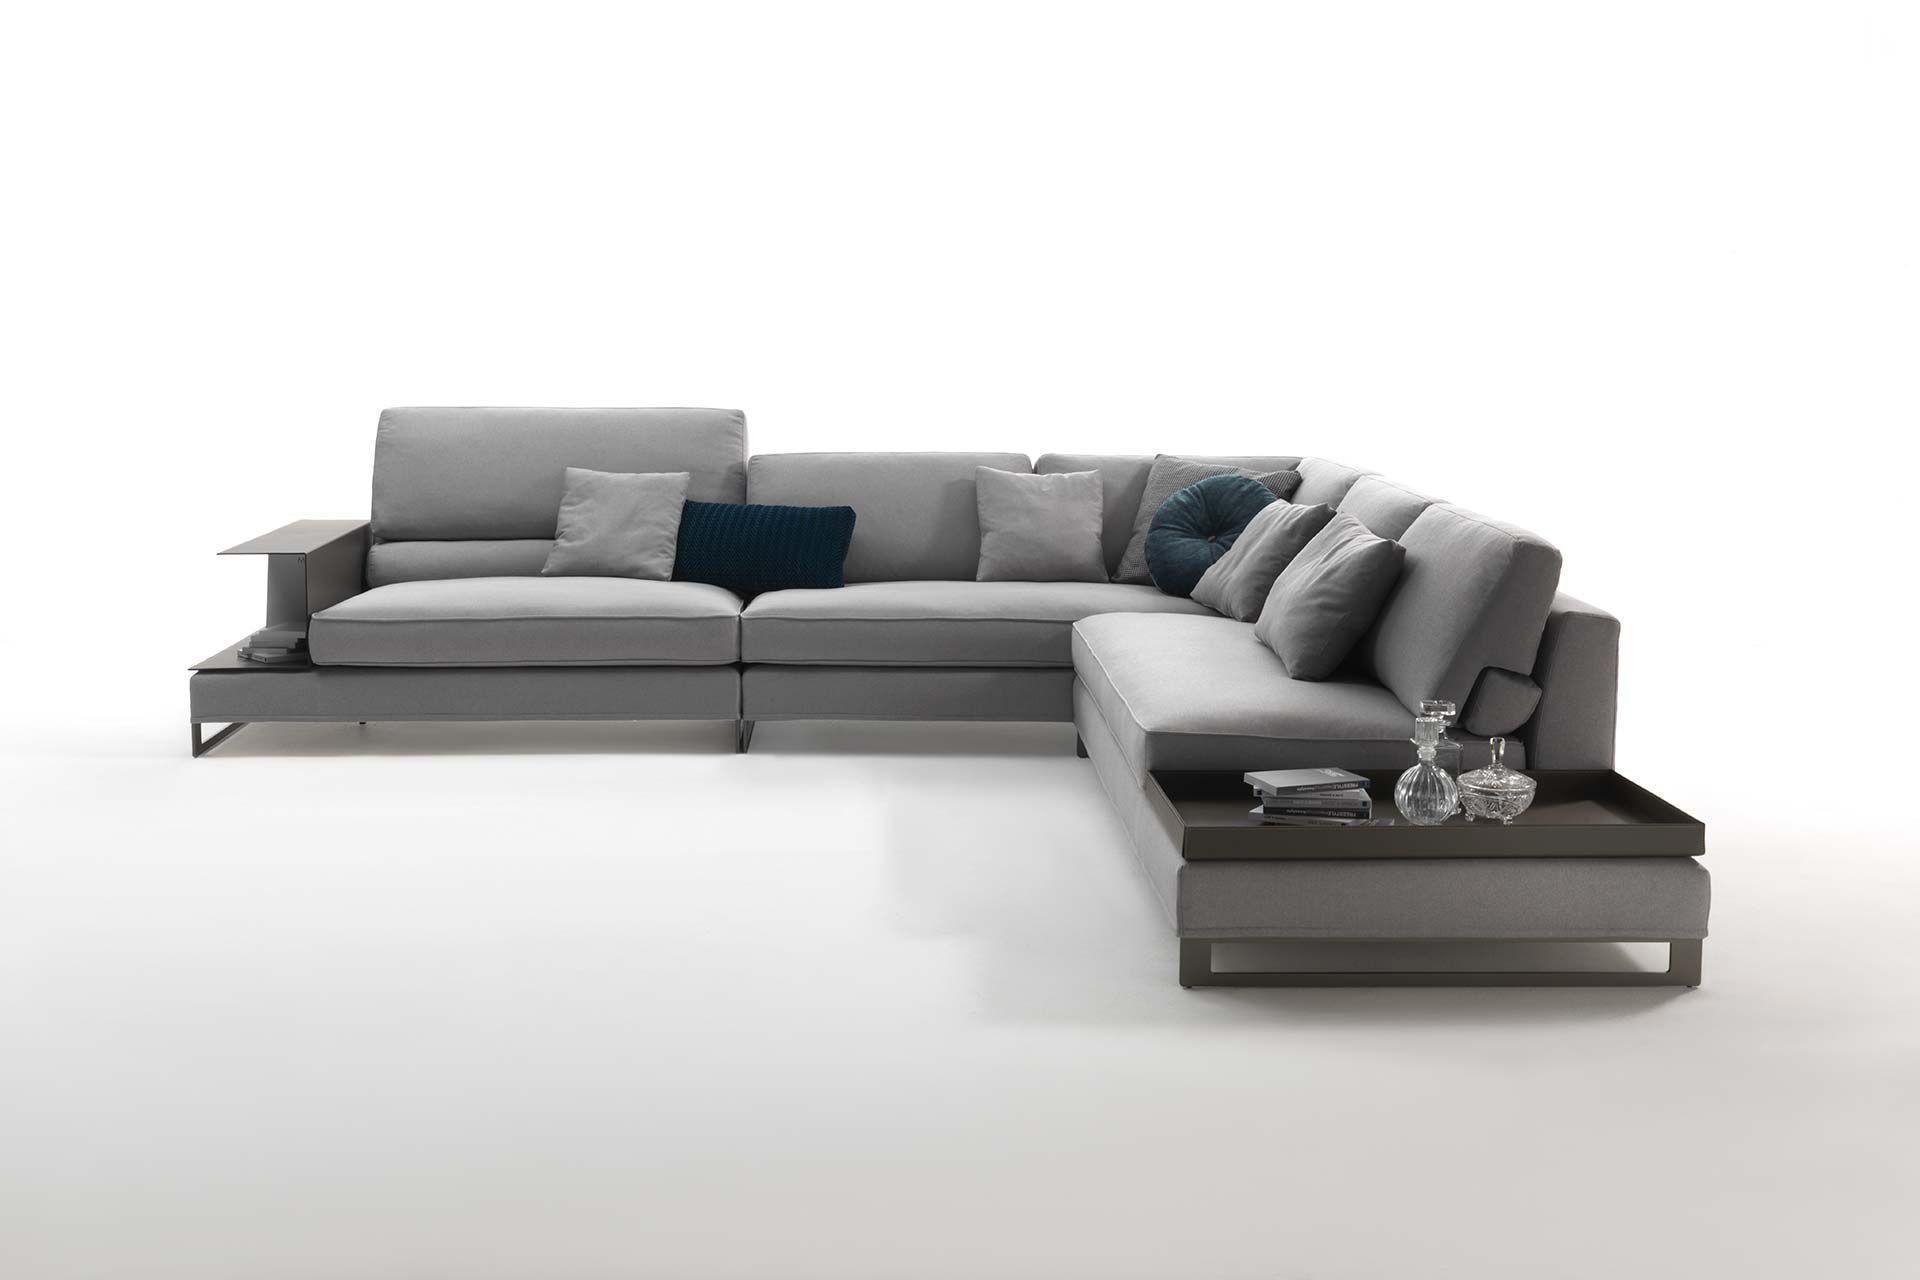 Modular Sofa / Contemporary / Fabric / Leather – Davis Case Pertaining To Davis Sofas (Image 15 of 20)